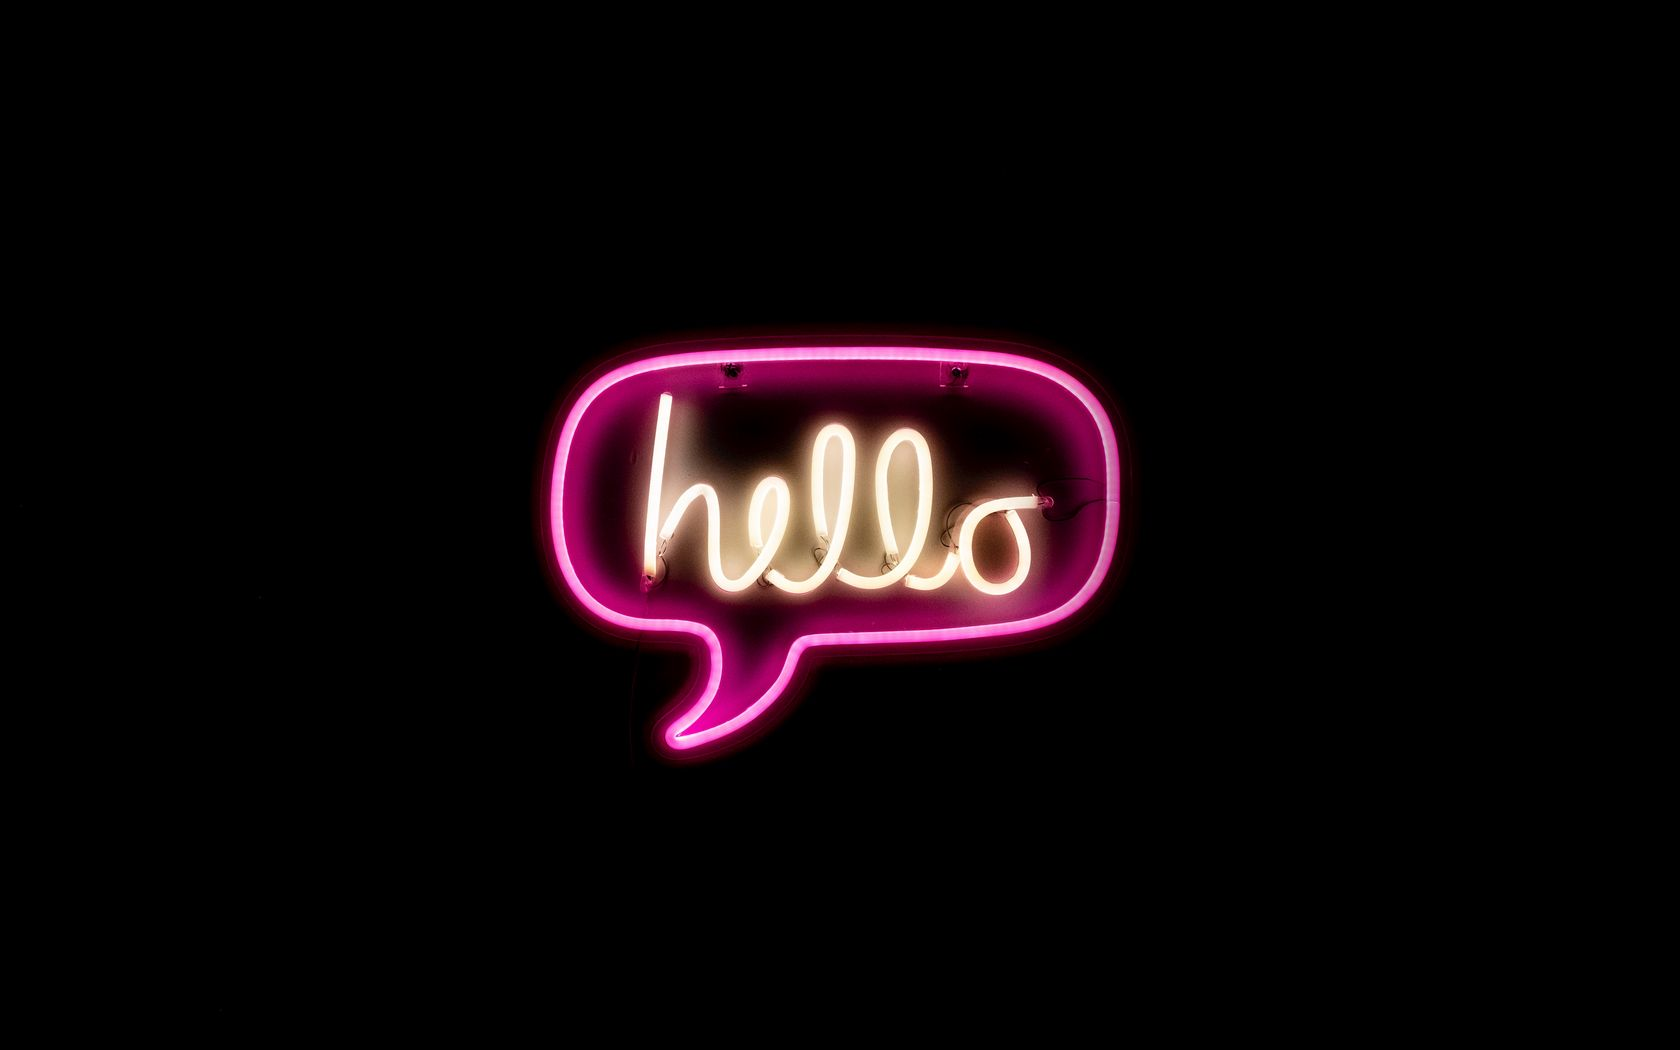 1680x1050 Wallpaper hello, neon, inscription, text